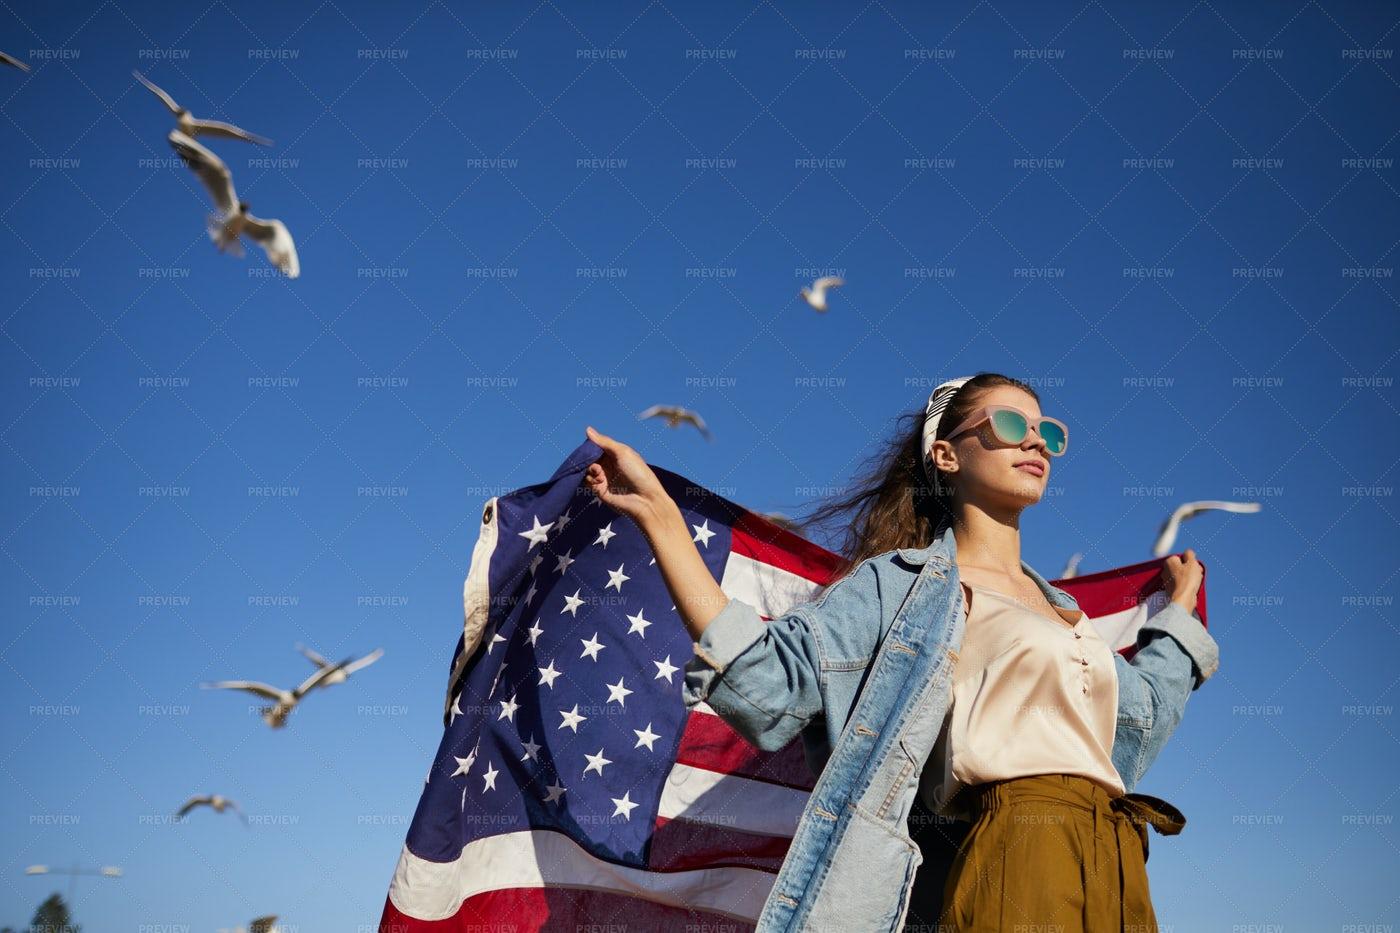 Stylish Girl In Wind: Stock Photos